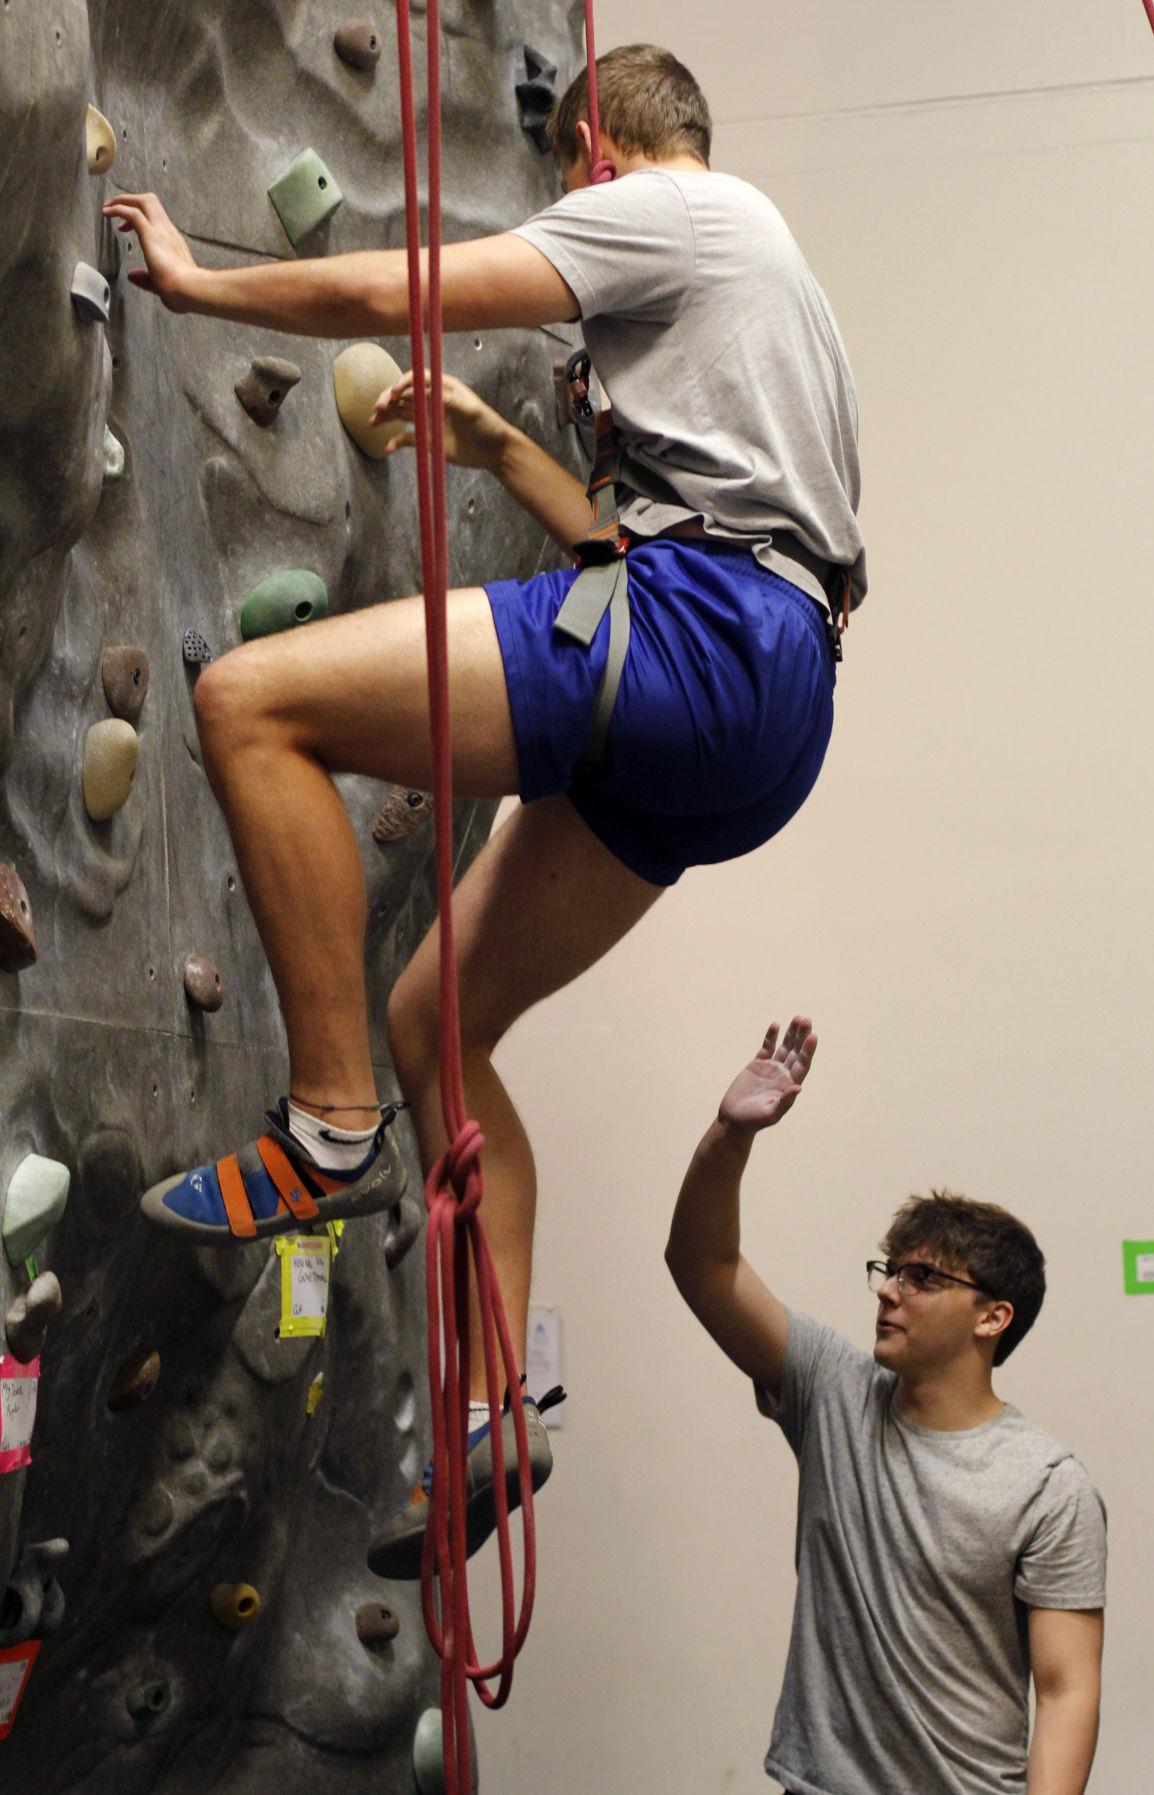 Rock climbing: the alternative exercise experience